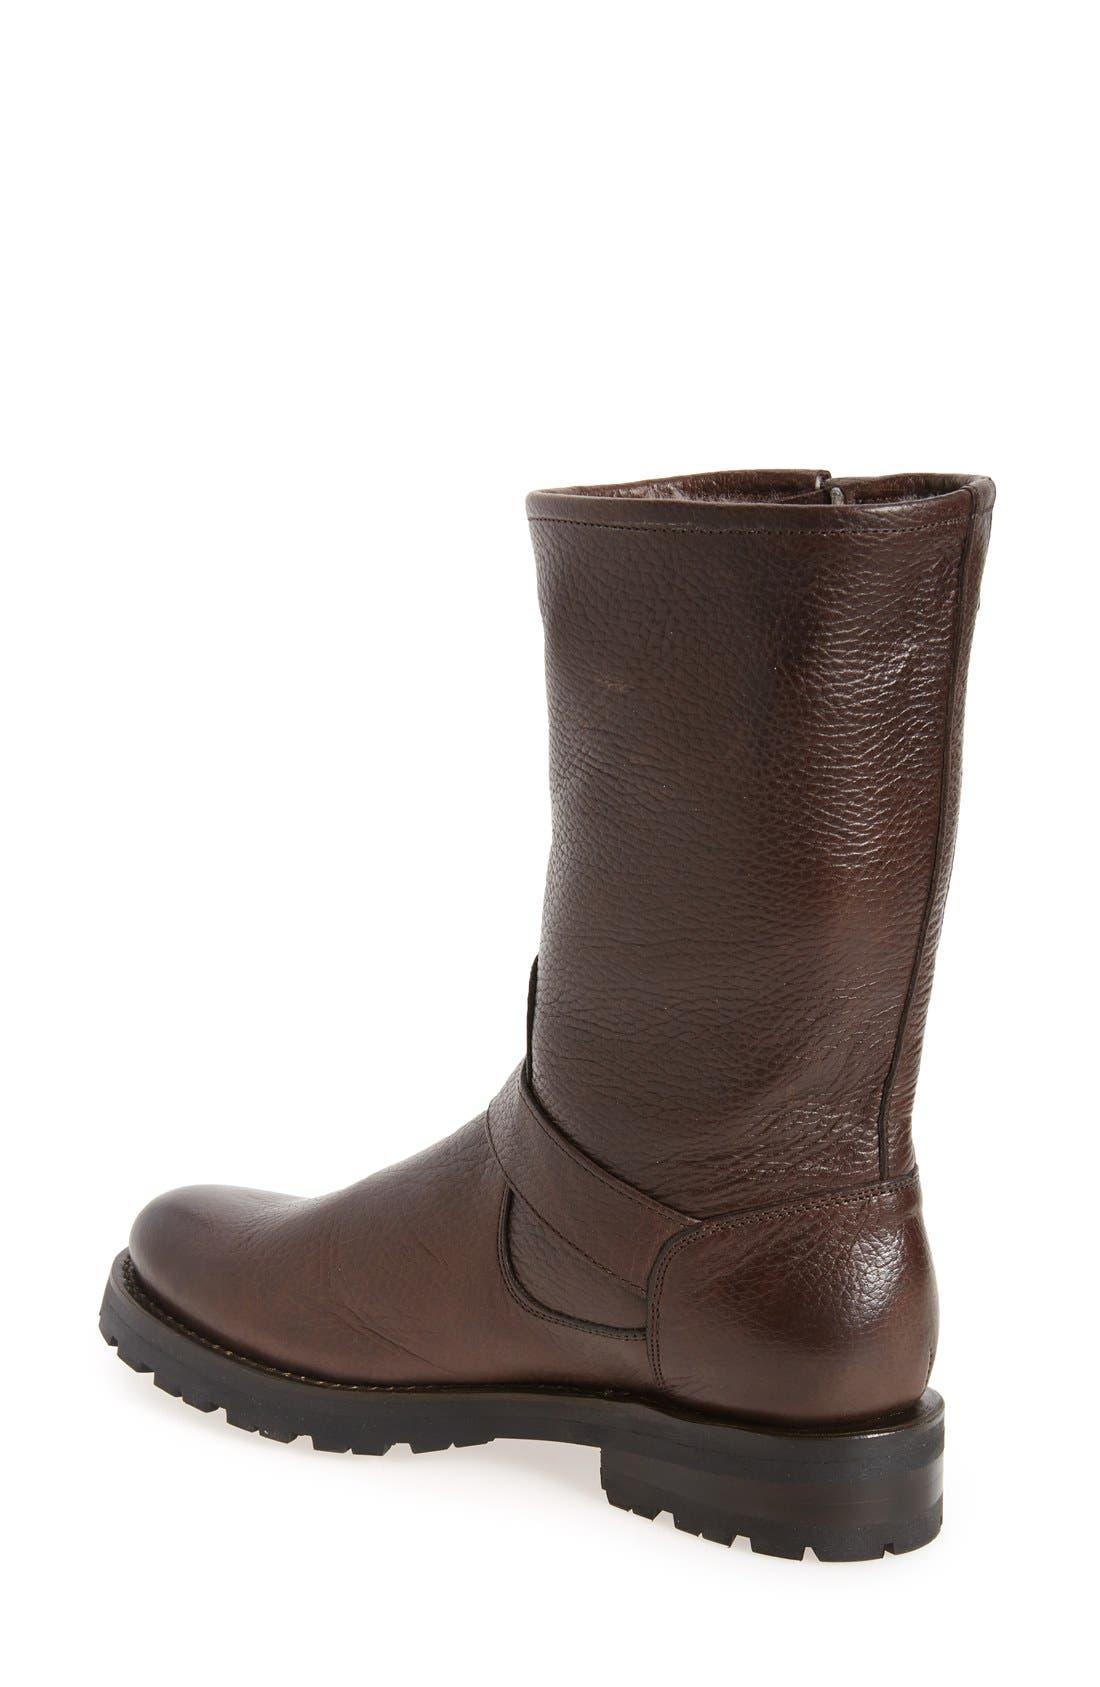 Alternate Image 2  - Frye Natalie Buckle Strap Engineer Genuine Shearling Lined Boot (Women)